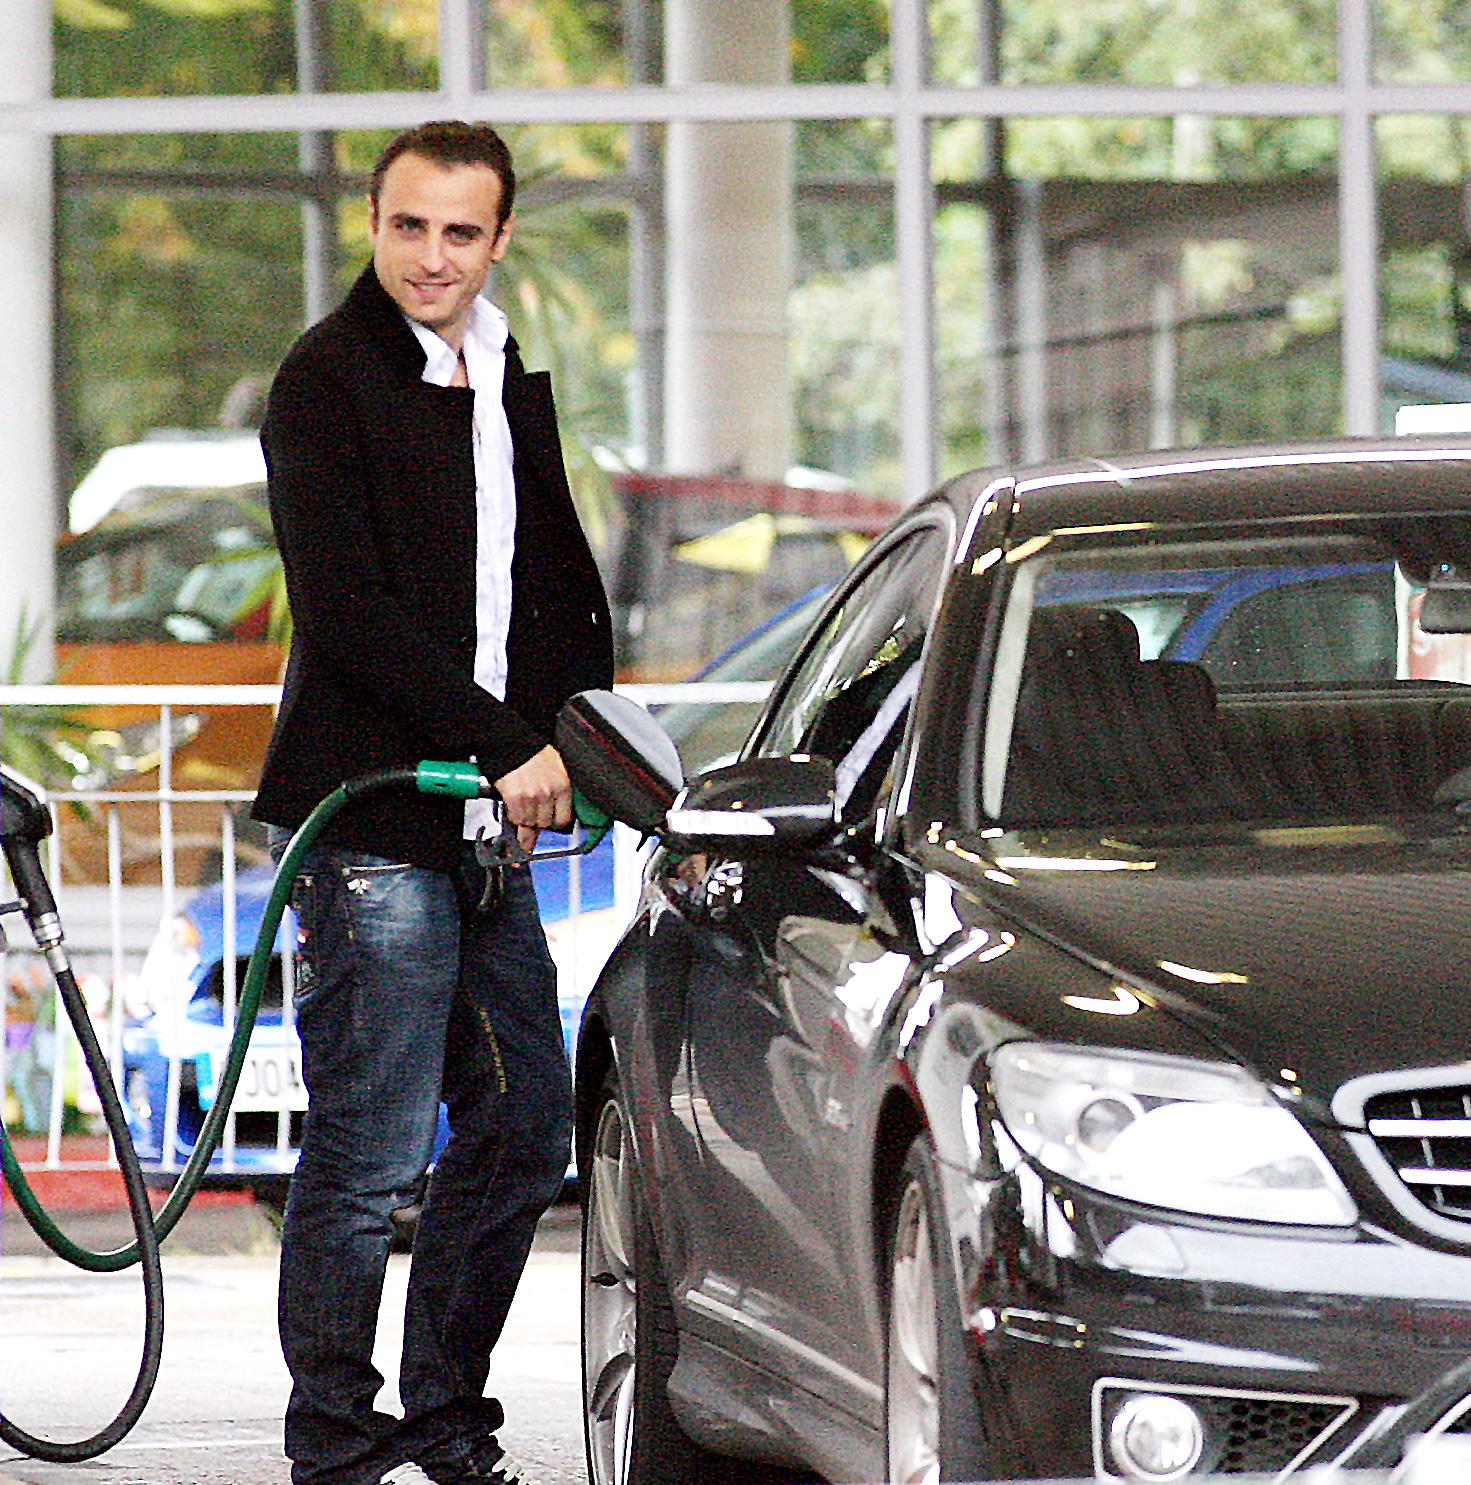 http://2.bp.blogspot.com/-bMIeRz0NVlI/UFrbjoaLKiI/AAAAAAAAAYM/JoeQubyTxvE/s1600/dimitar-berbatov-fashion-style-car-wallpaper.jpg